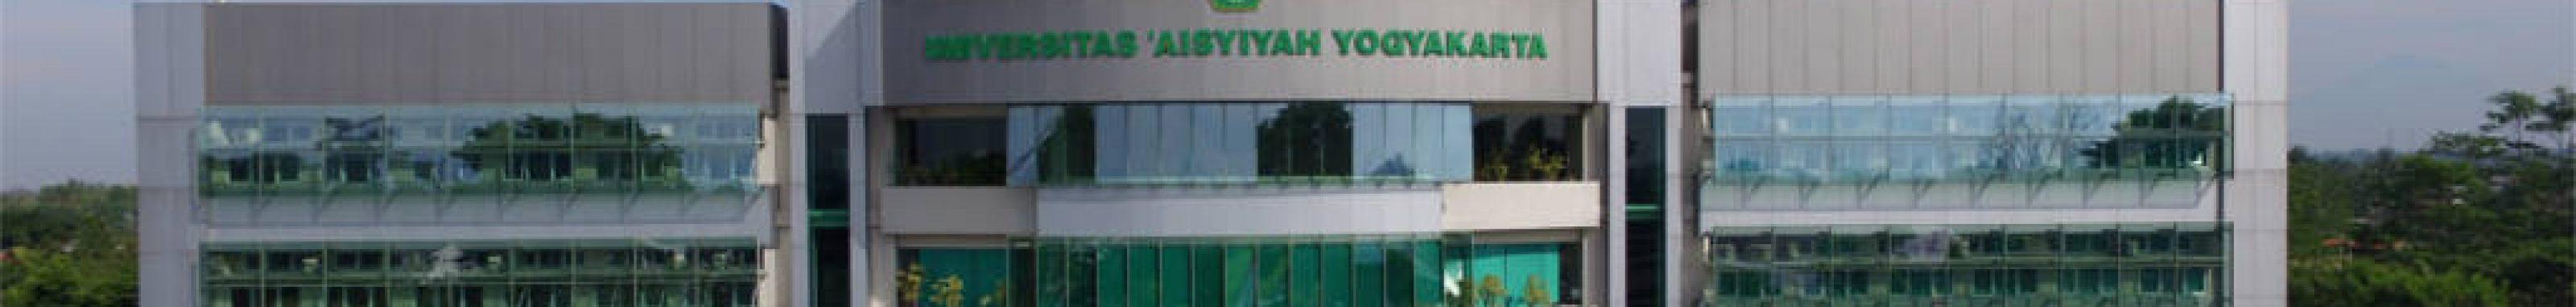 Universitas 'Aisyiyah Yogyakarta